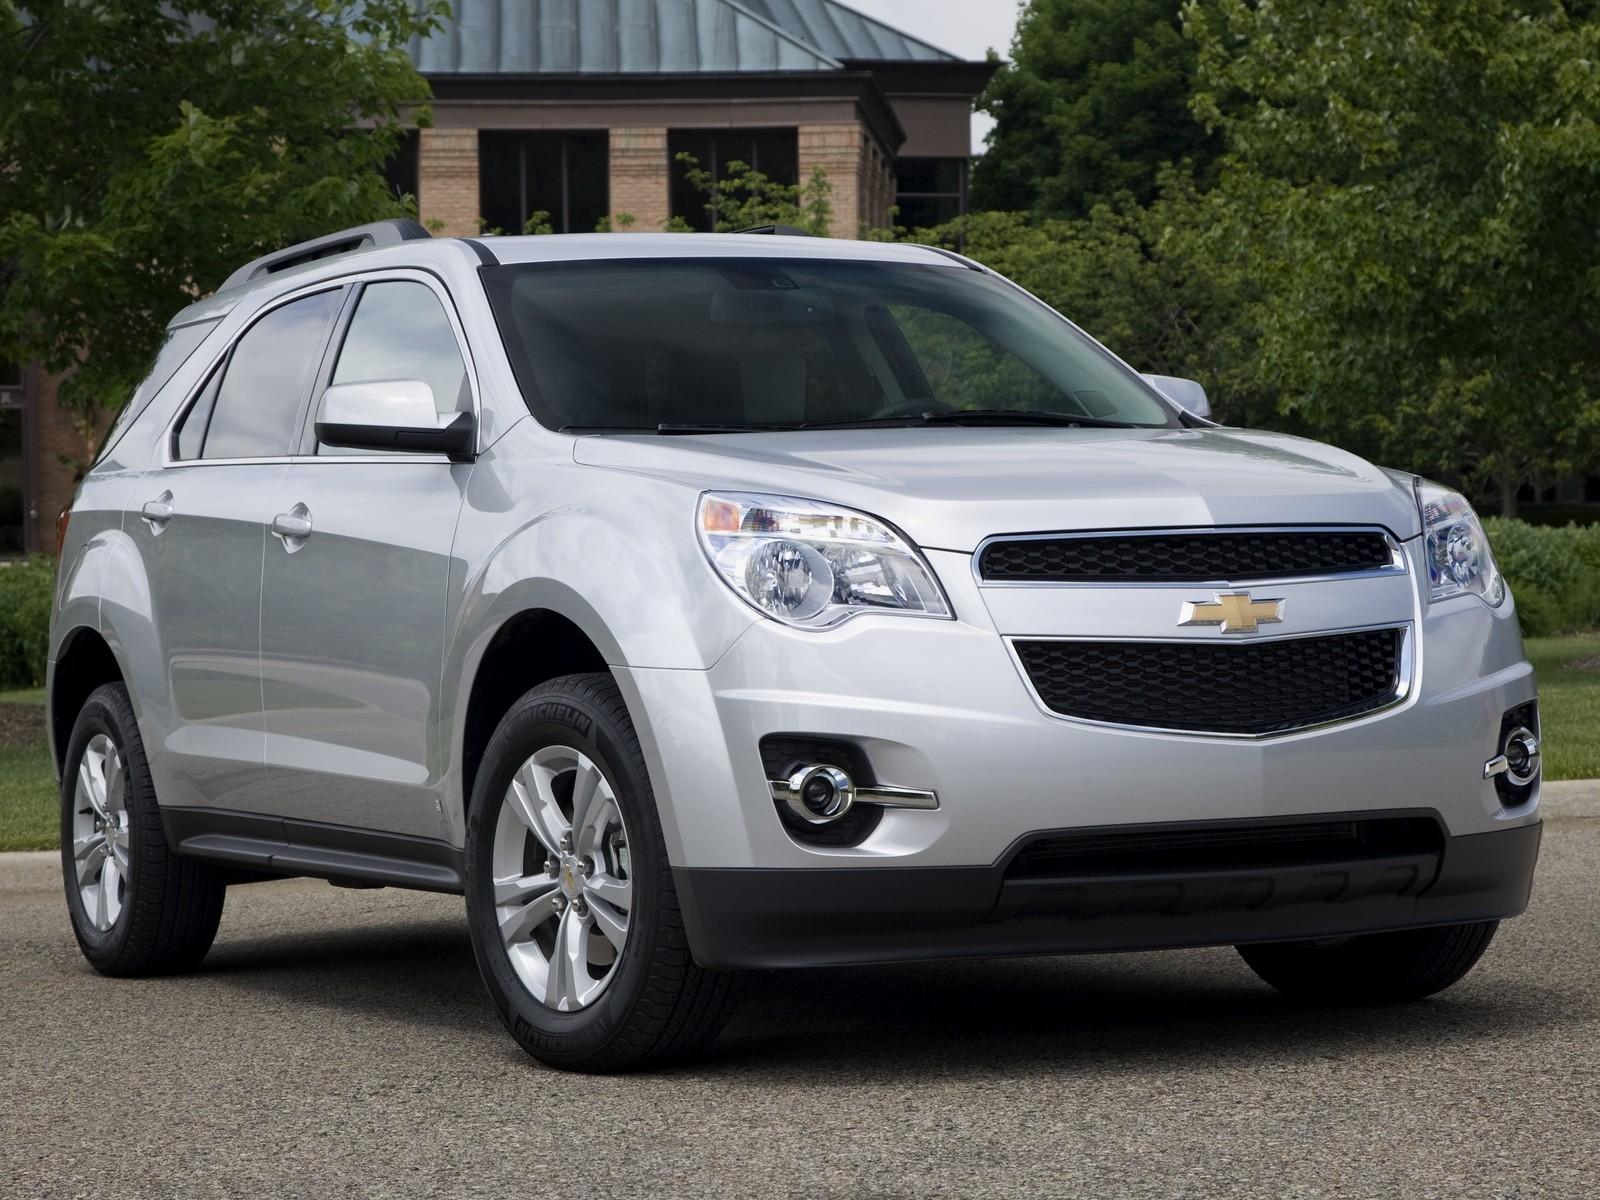 Chevrolet Equinox 2009 2010 2011 2012 2013 2014